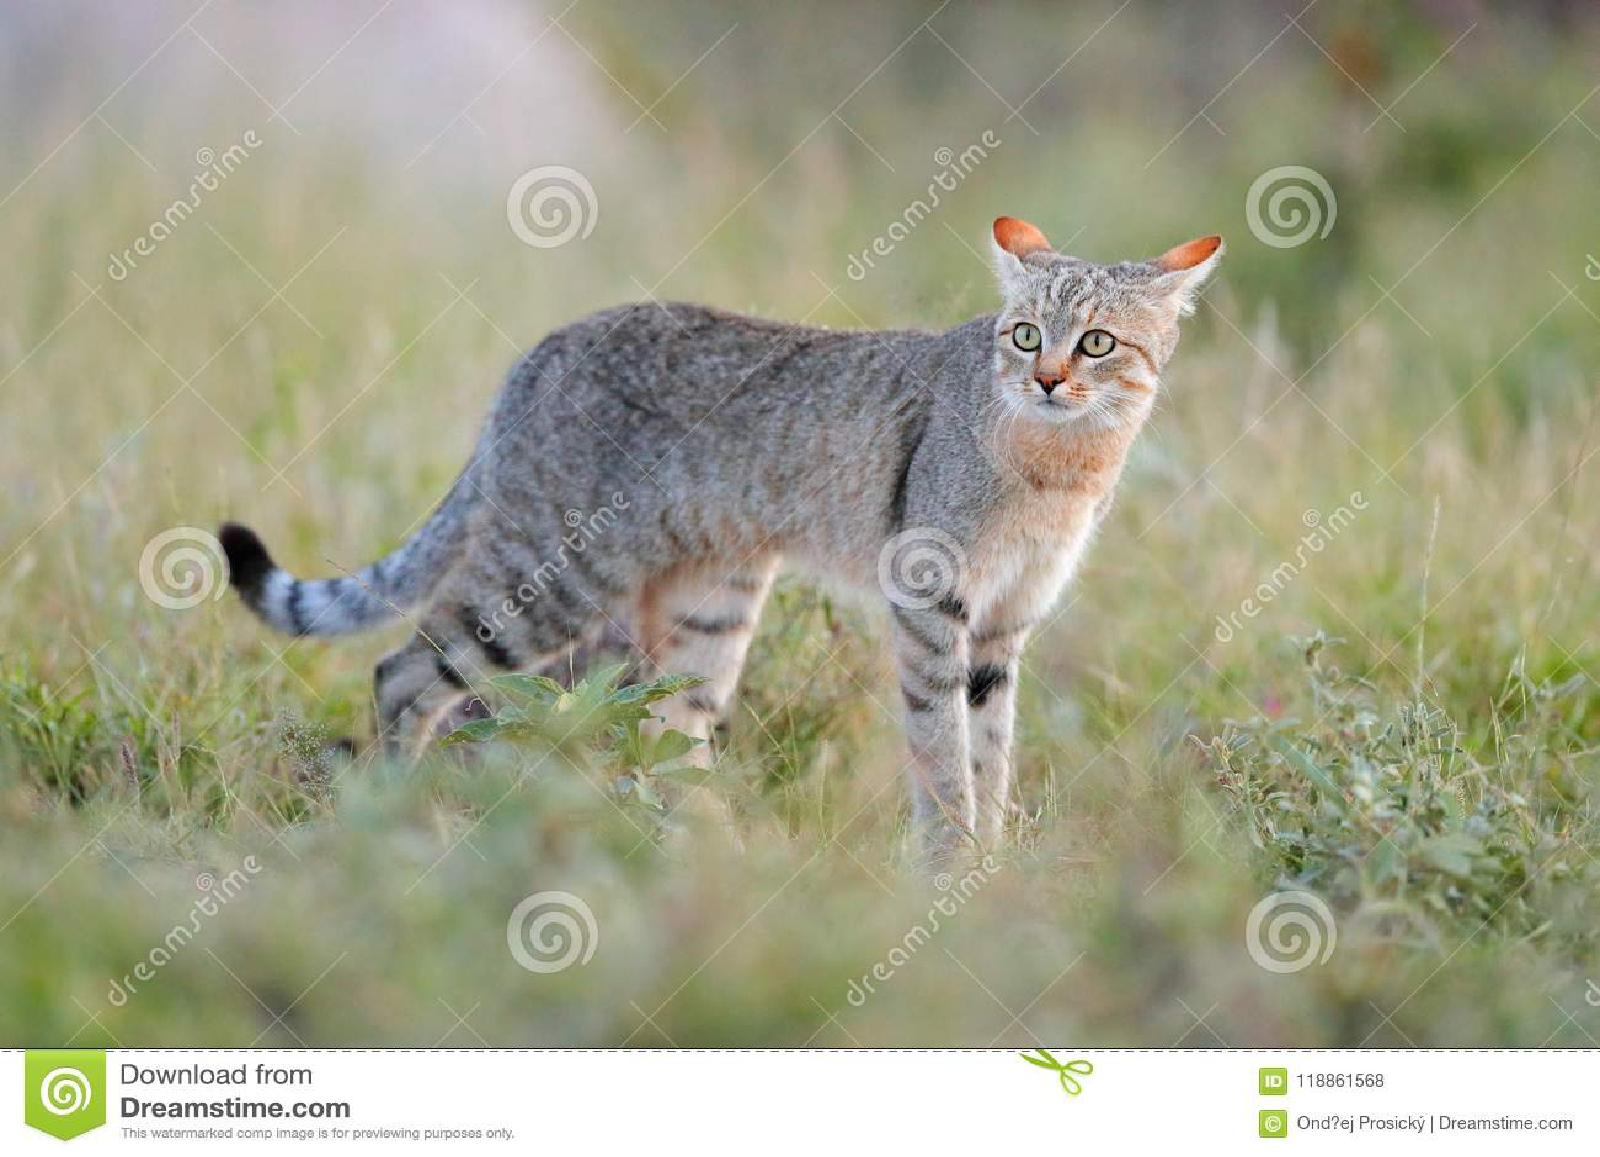 African wildcat, Felis lybica, also called Near Eastern Wild Cat. Wild animal in nature habitat, grass meadow. Wildlife nature. Wi